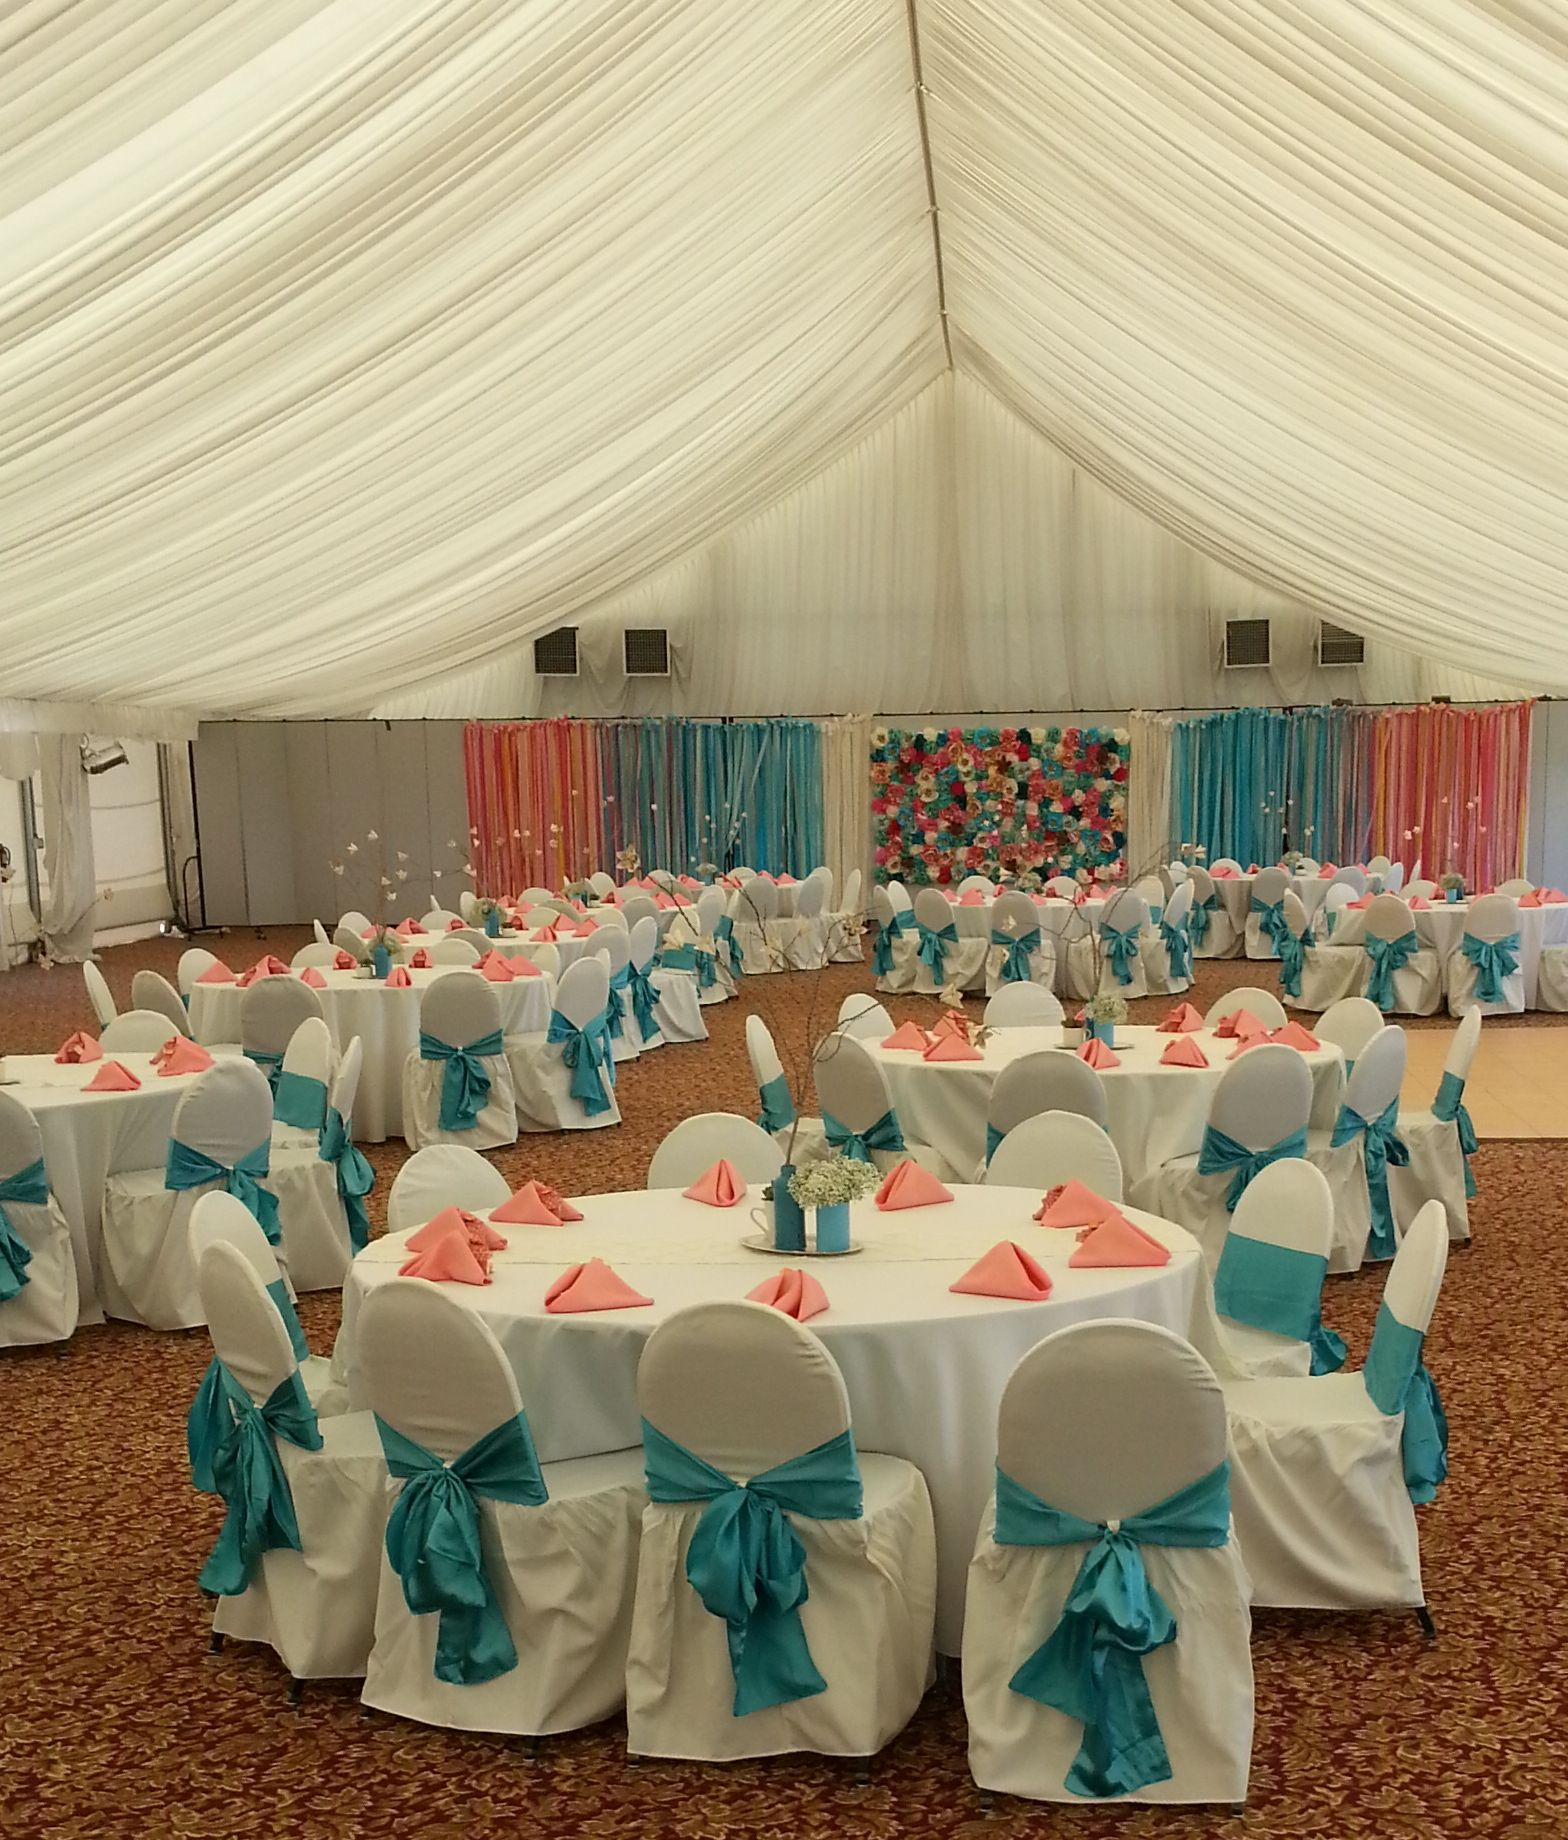 tiffany blue wedding chair covers glider rocking linens coral fabric napkins napkin aqua pool